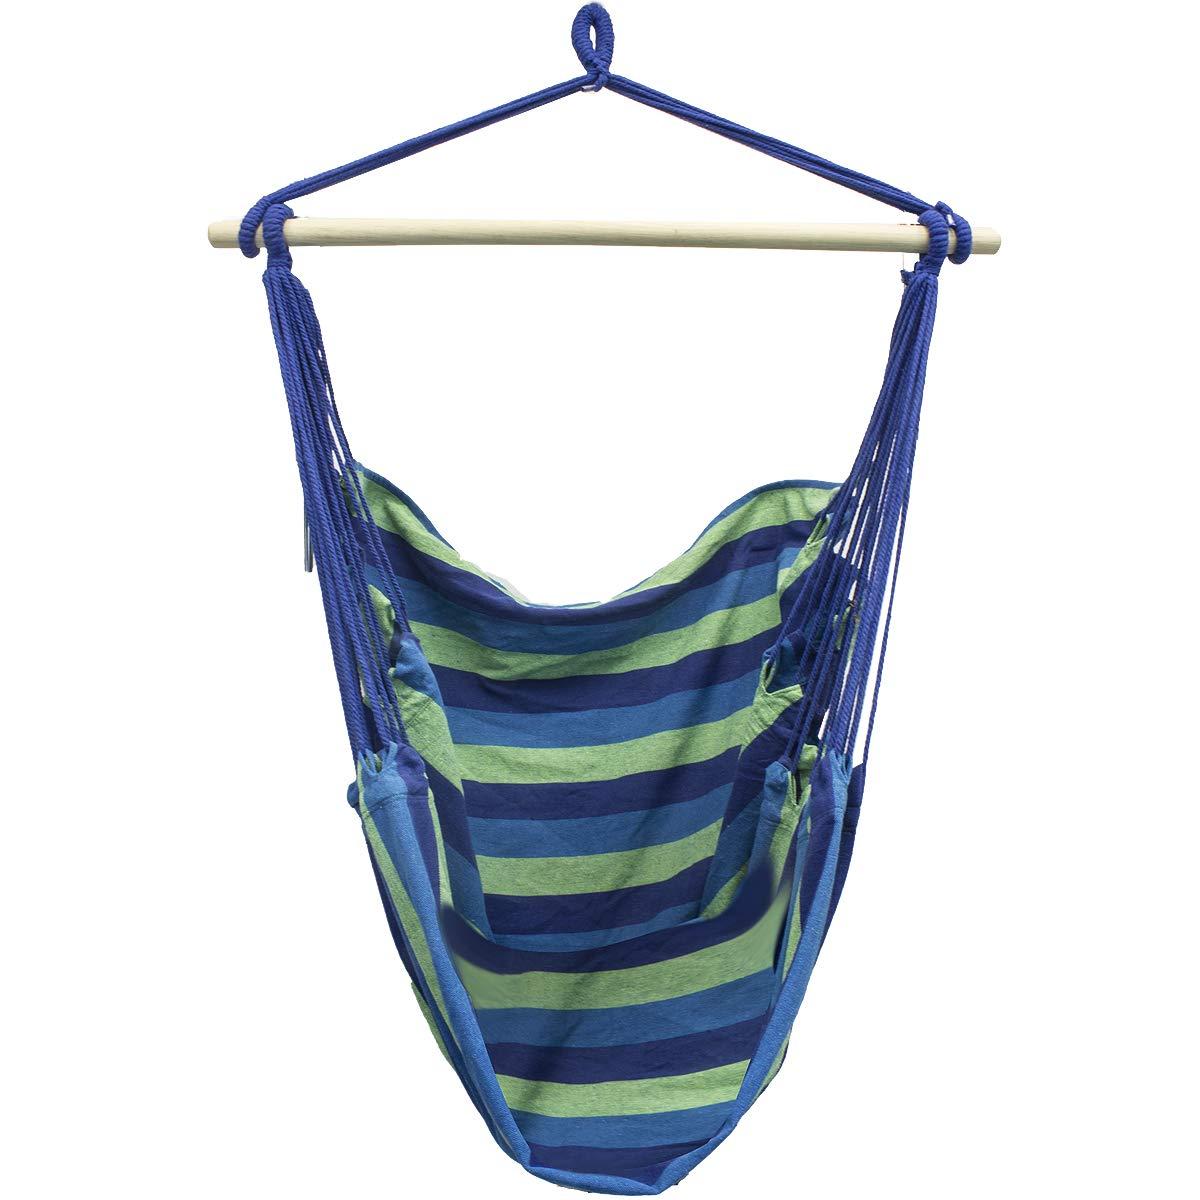 Sorbus HMK-PRTB-B Large Brazilian Hammock Chair-Cotton Weave-Extra Long Bed-(Blue and Green Stripes) ggi interntational